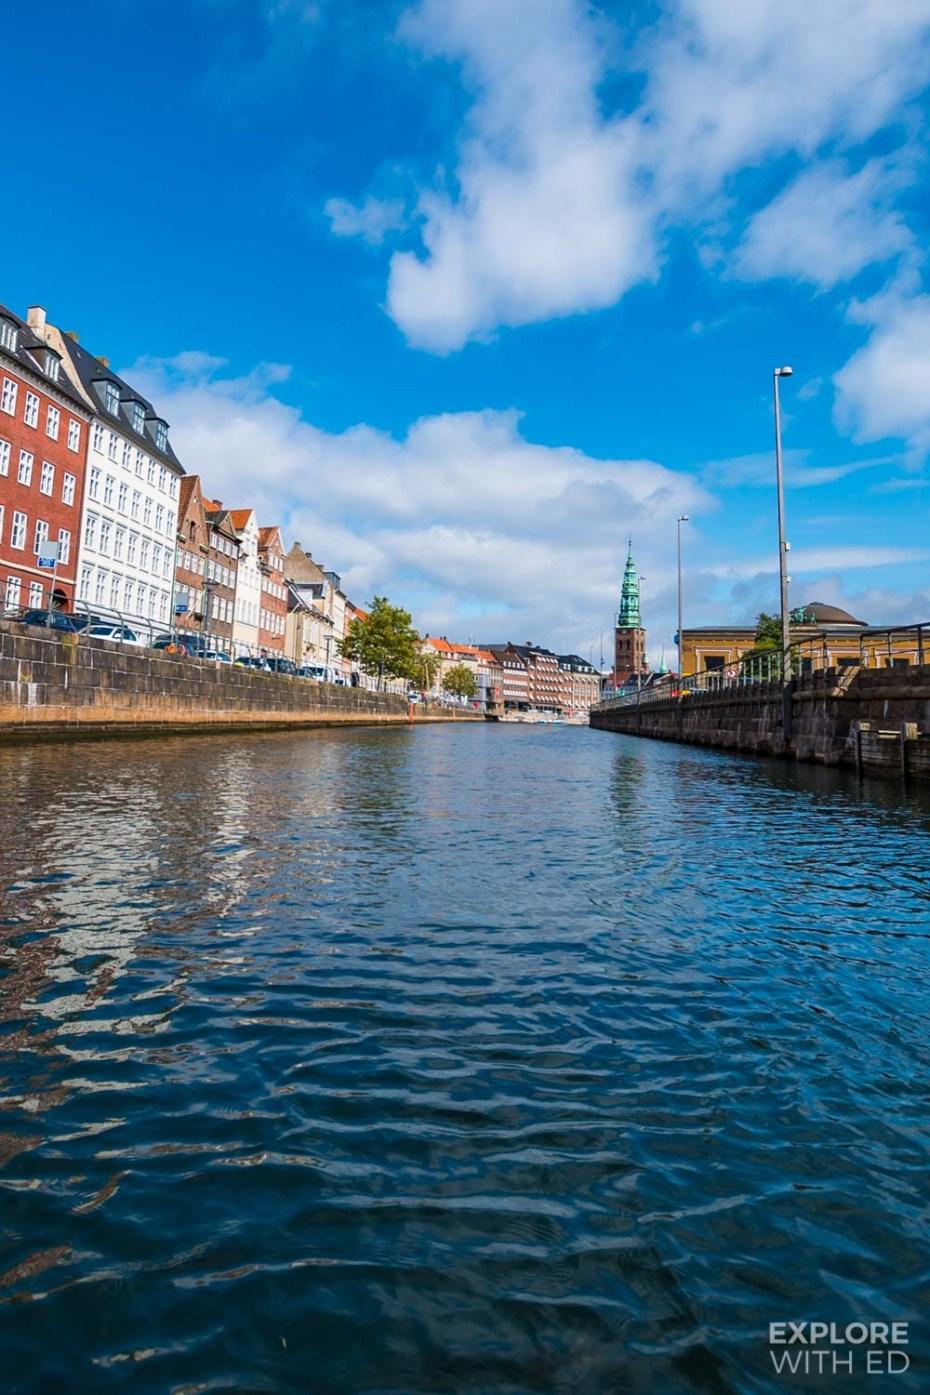 The Grand tour of Copenhagen